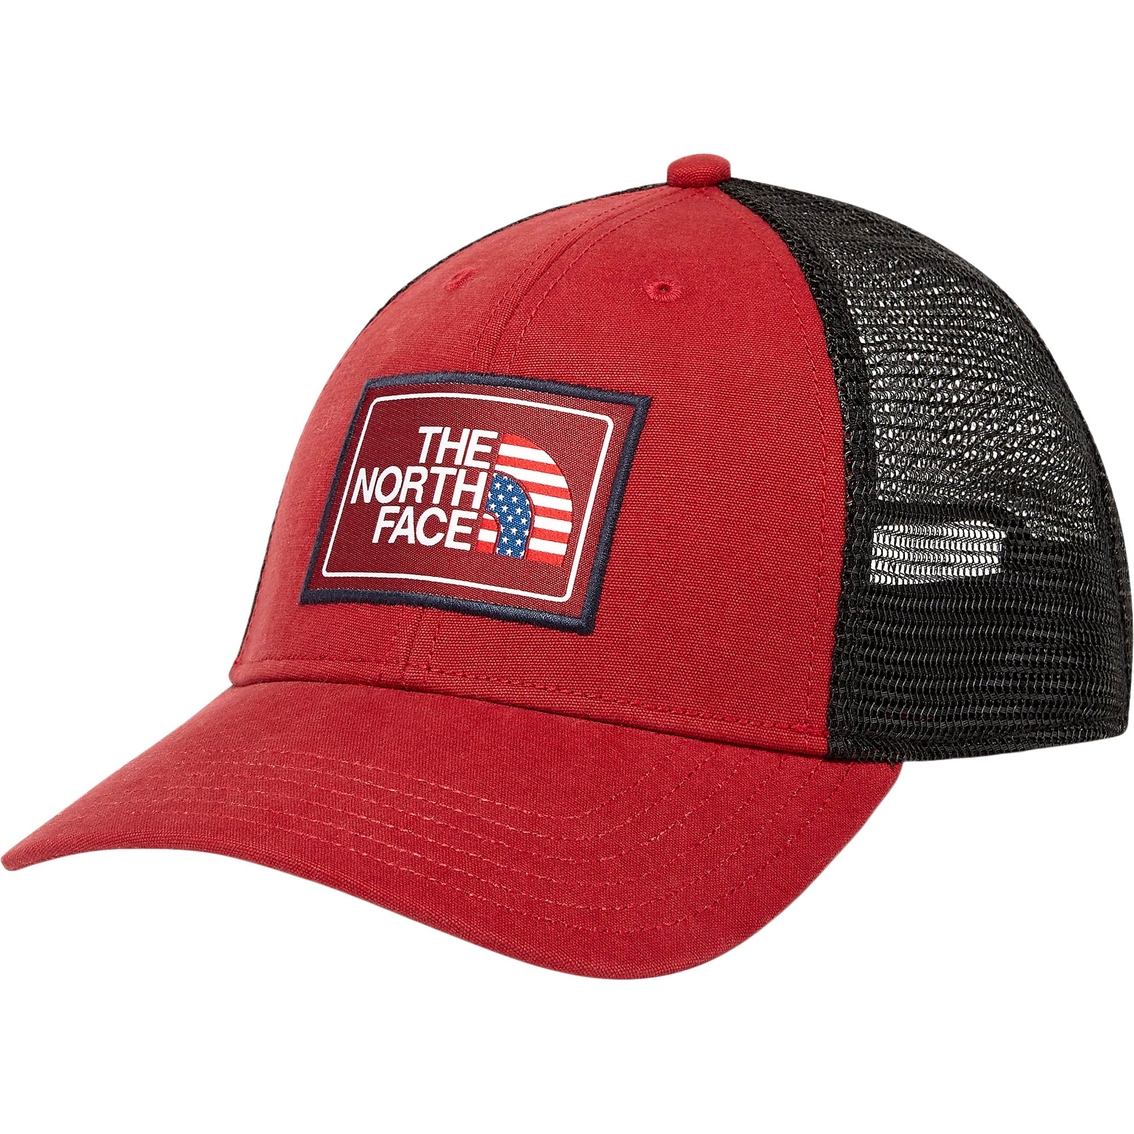 b399d5d04342c The North Face Americana Trucker Hat